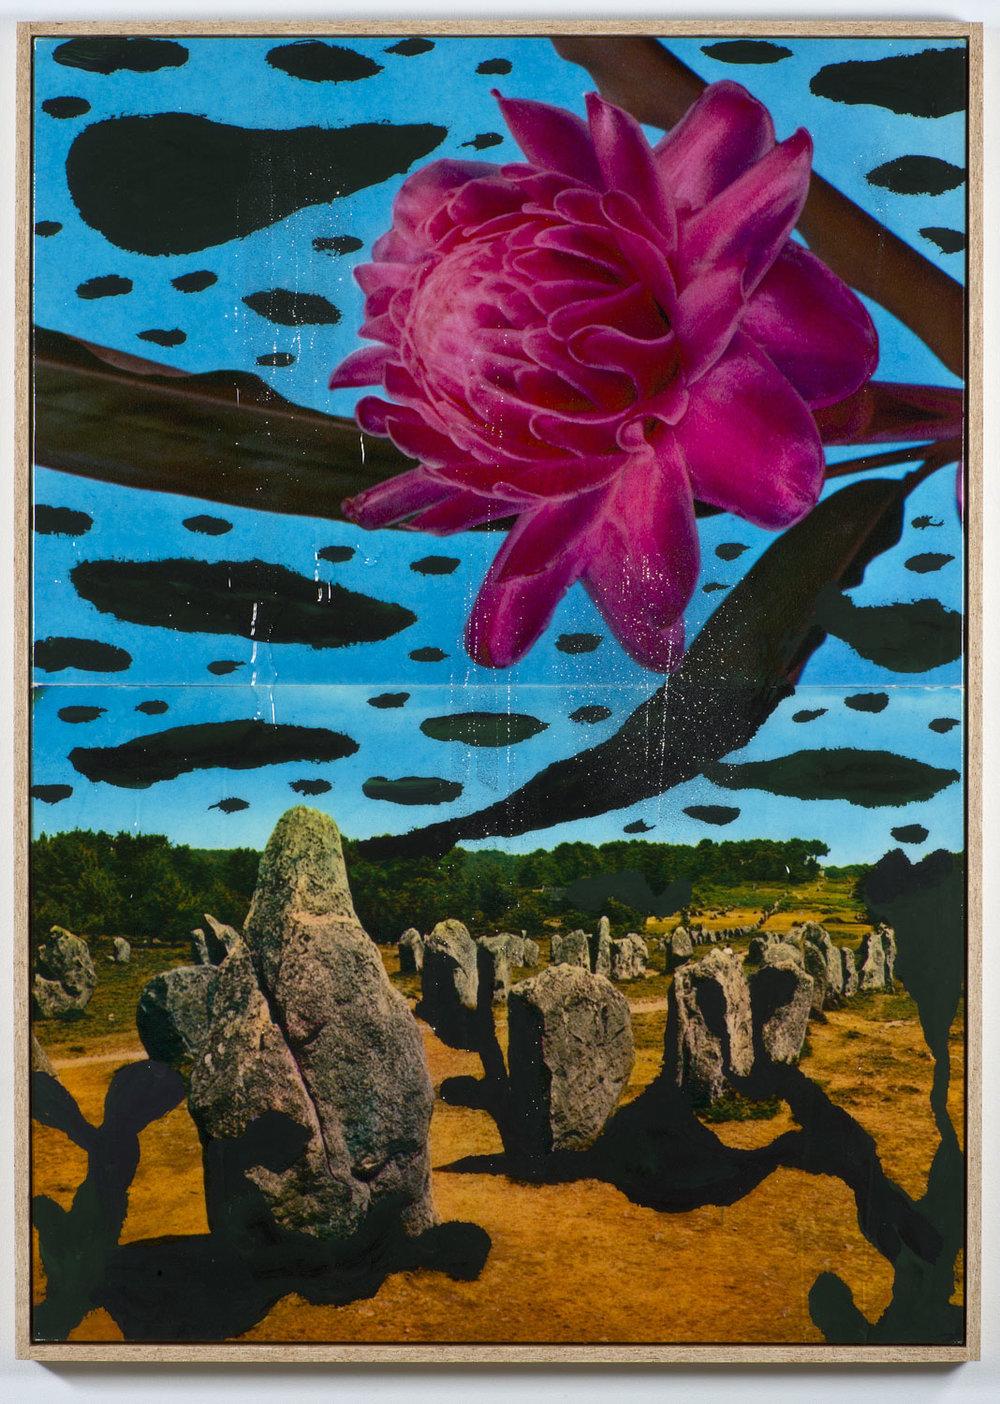 Pierre Ardouvin   Ecran de veille (Screensaver) , 2013 print on canvas, resin, glitter, chipboard framing  66 7/8 x 47 1/4 in (169,86 x 120,02 cm) PA13P2